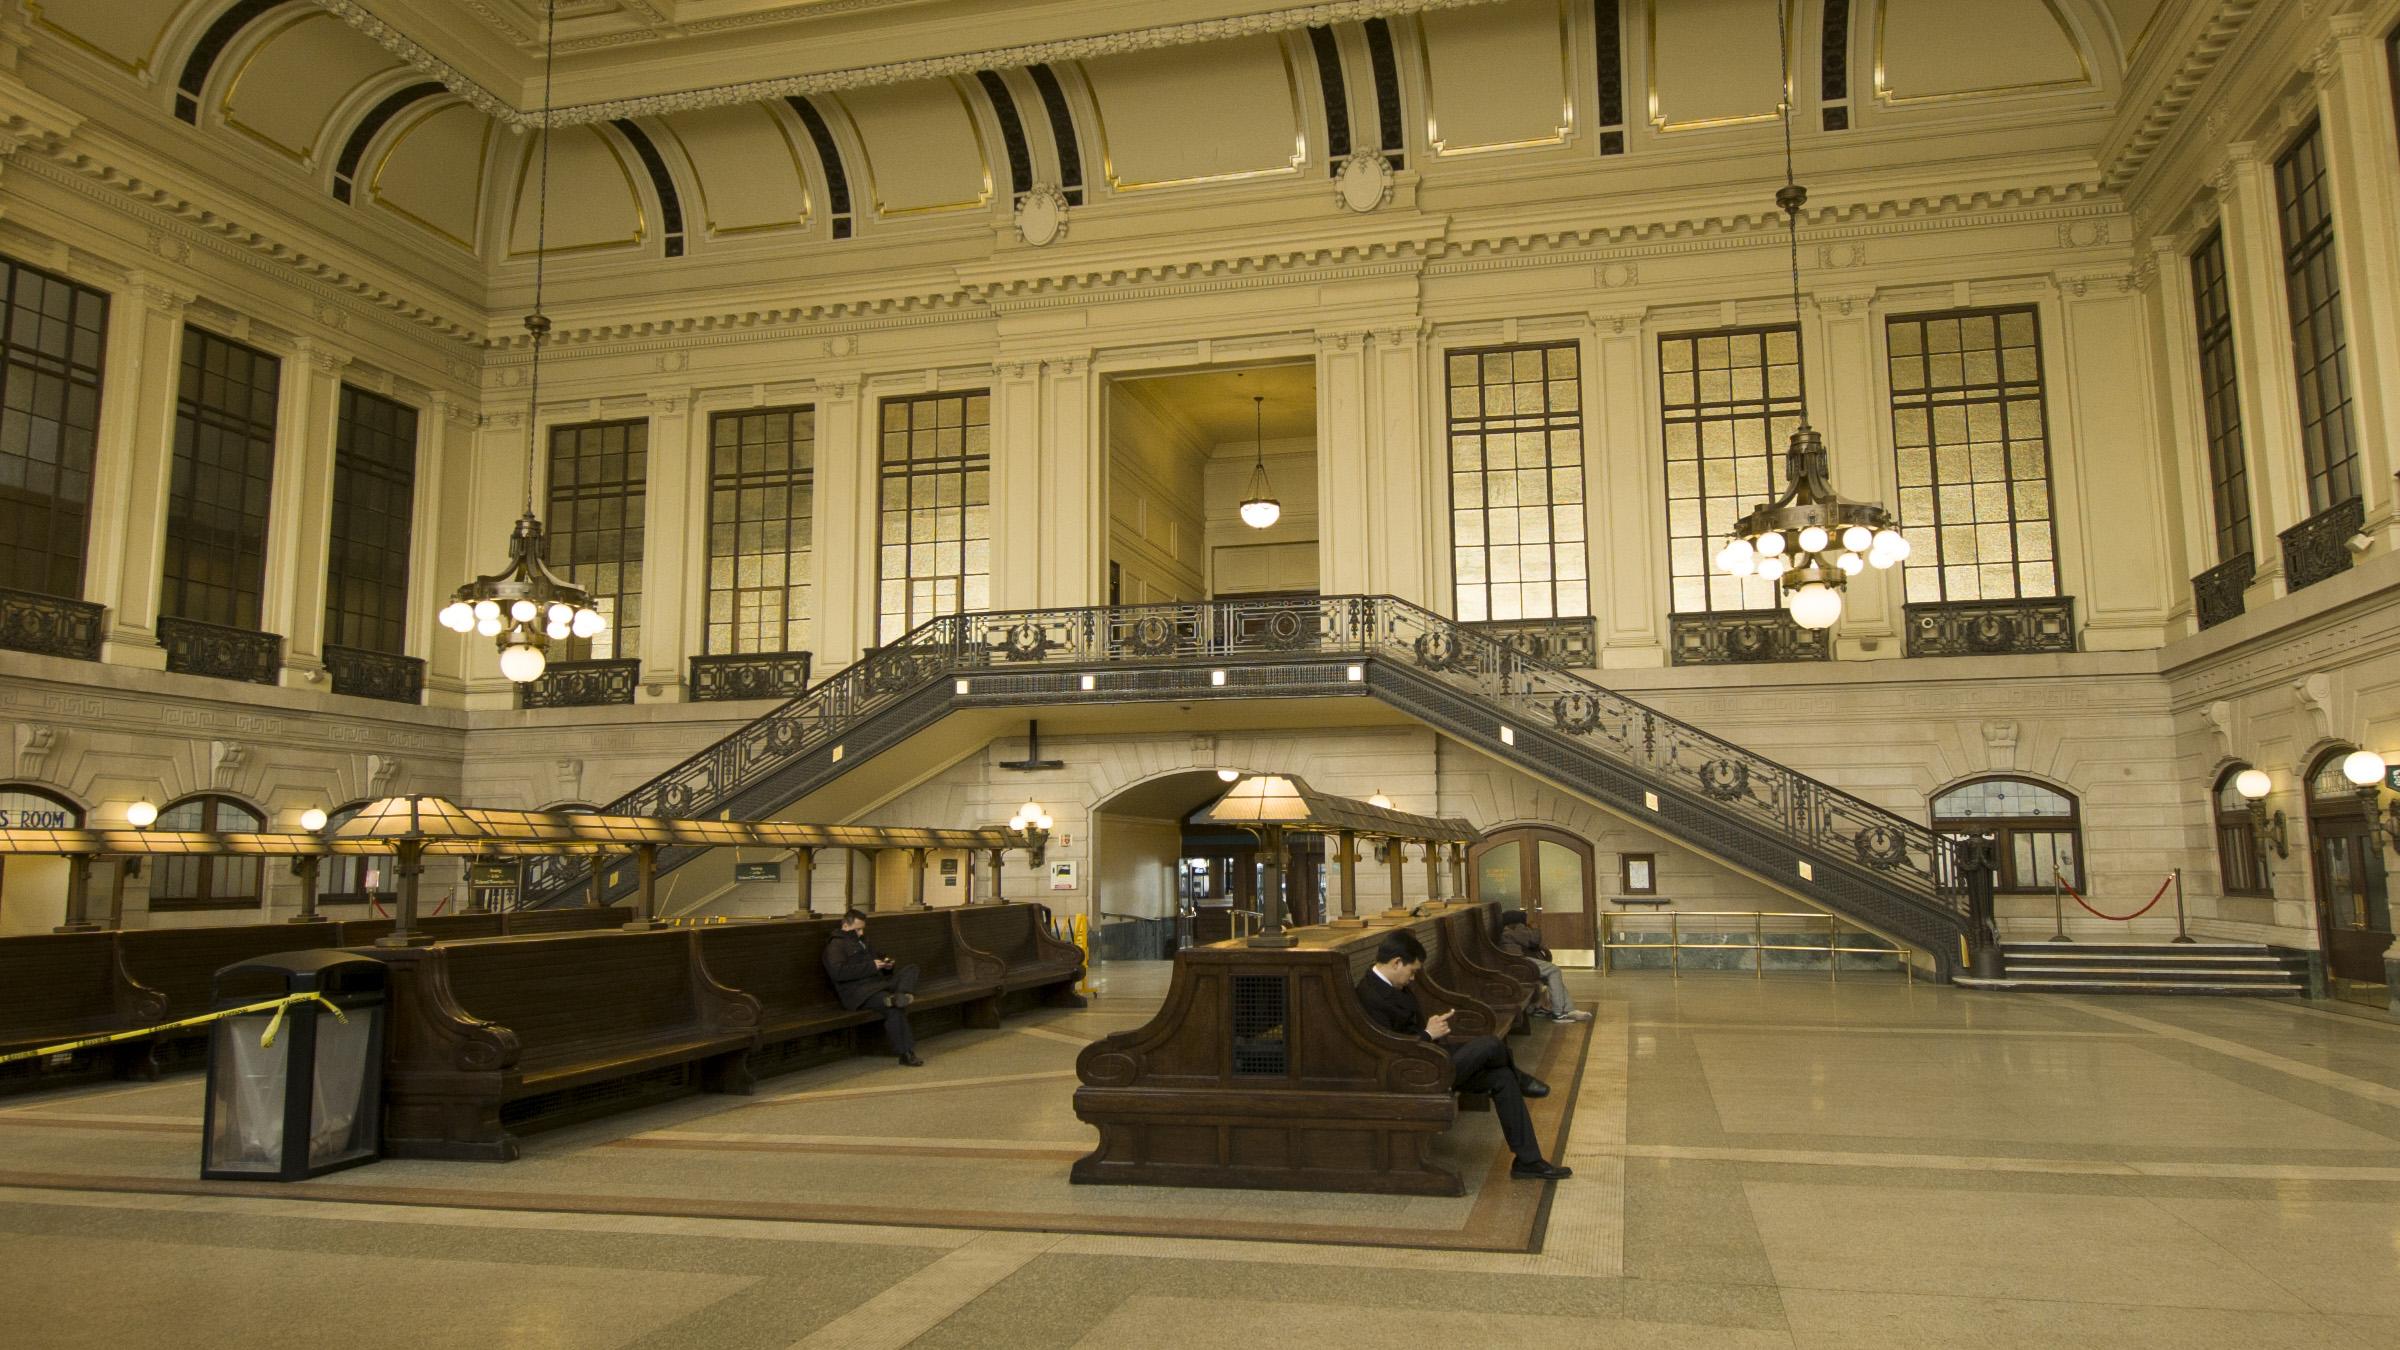 Train station 0439